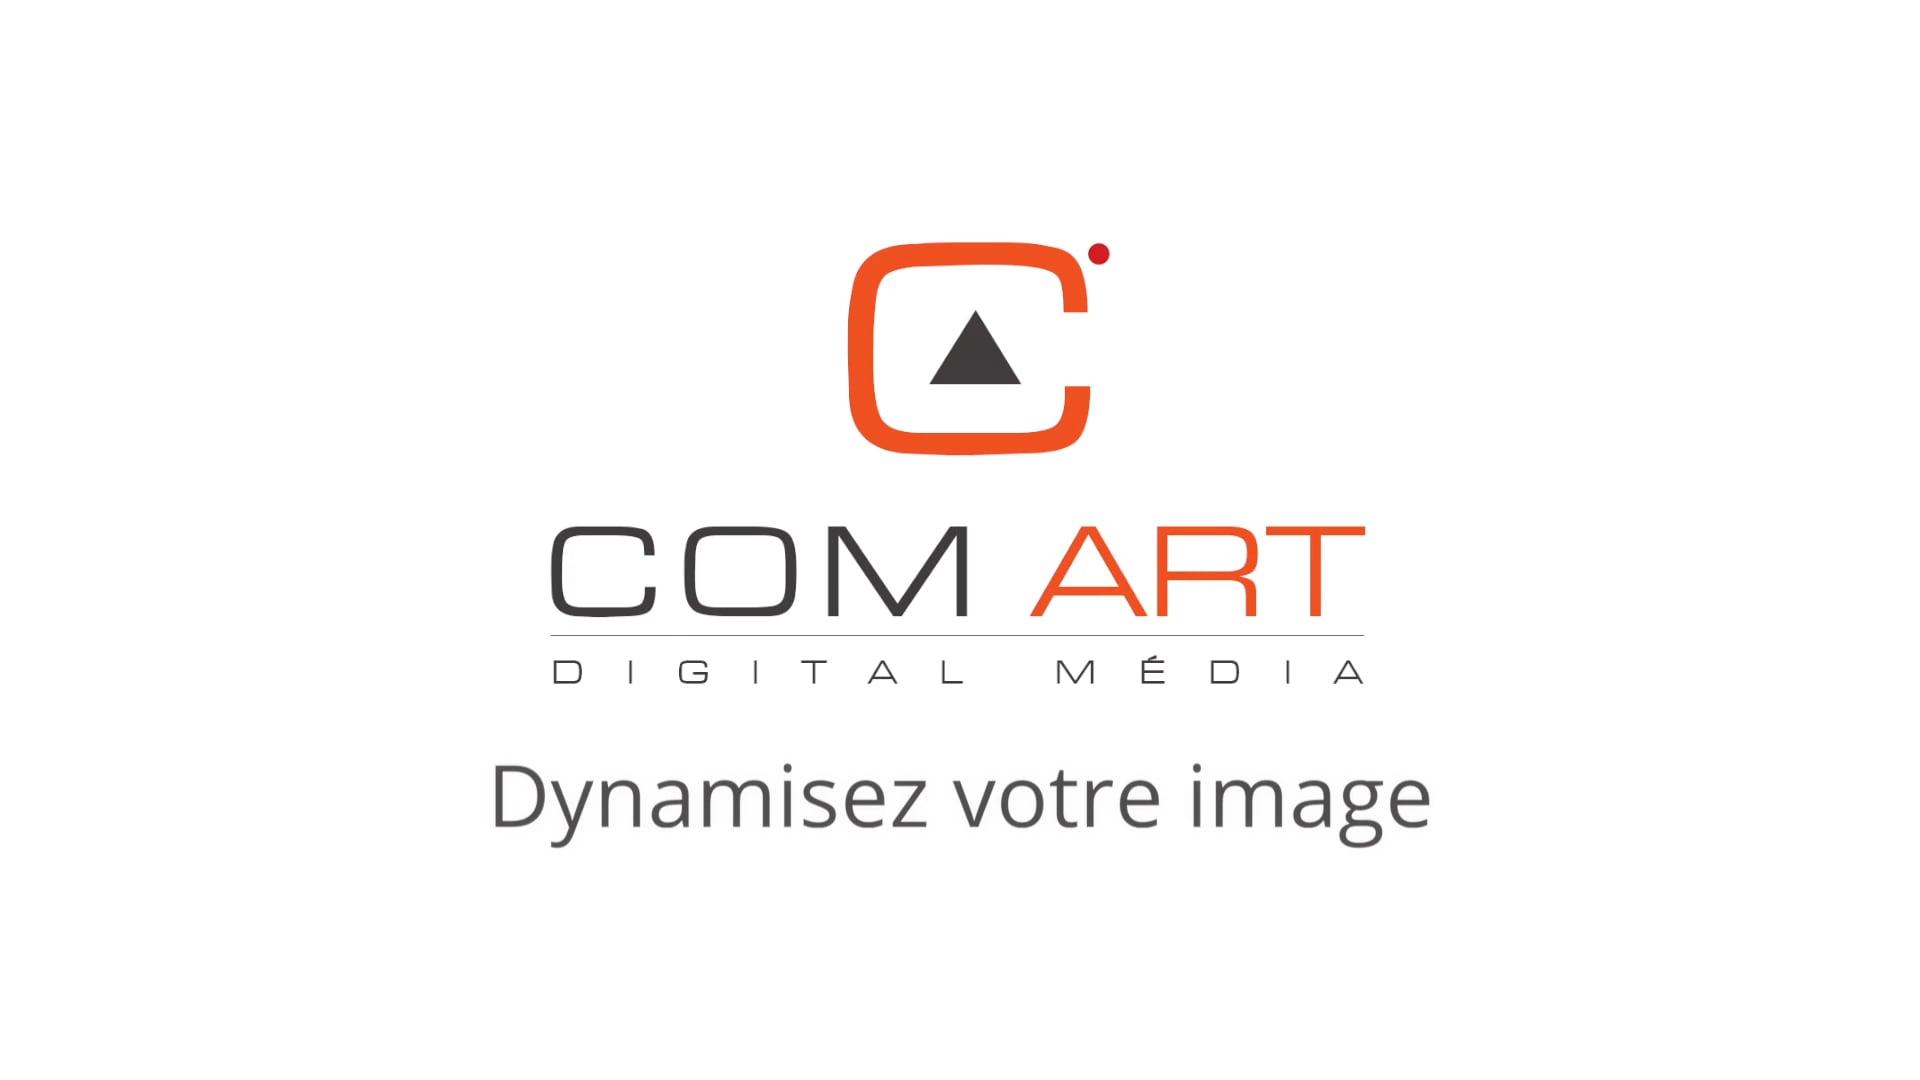 FILM MOTION DESIGN - CARTREIZE